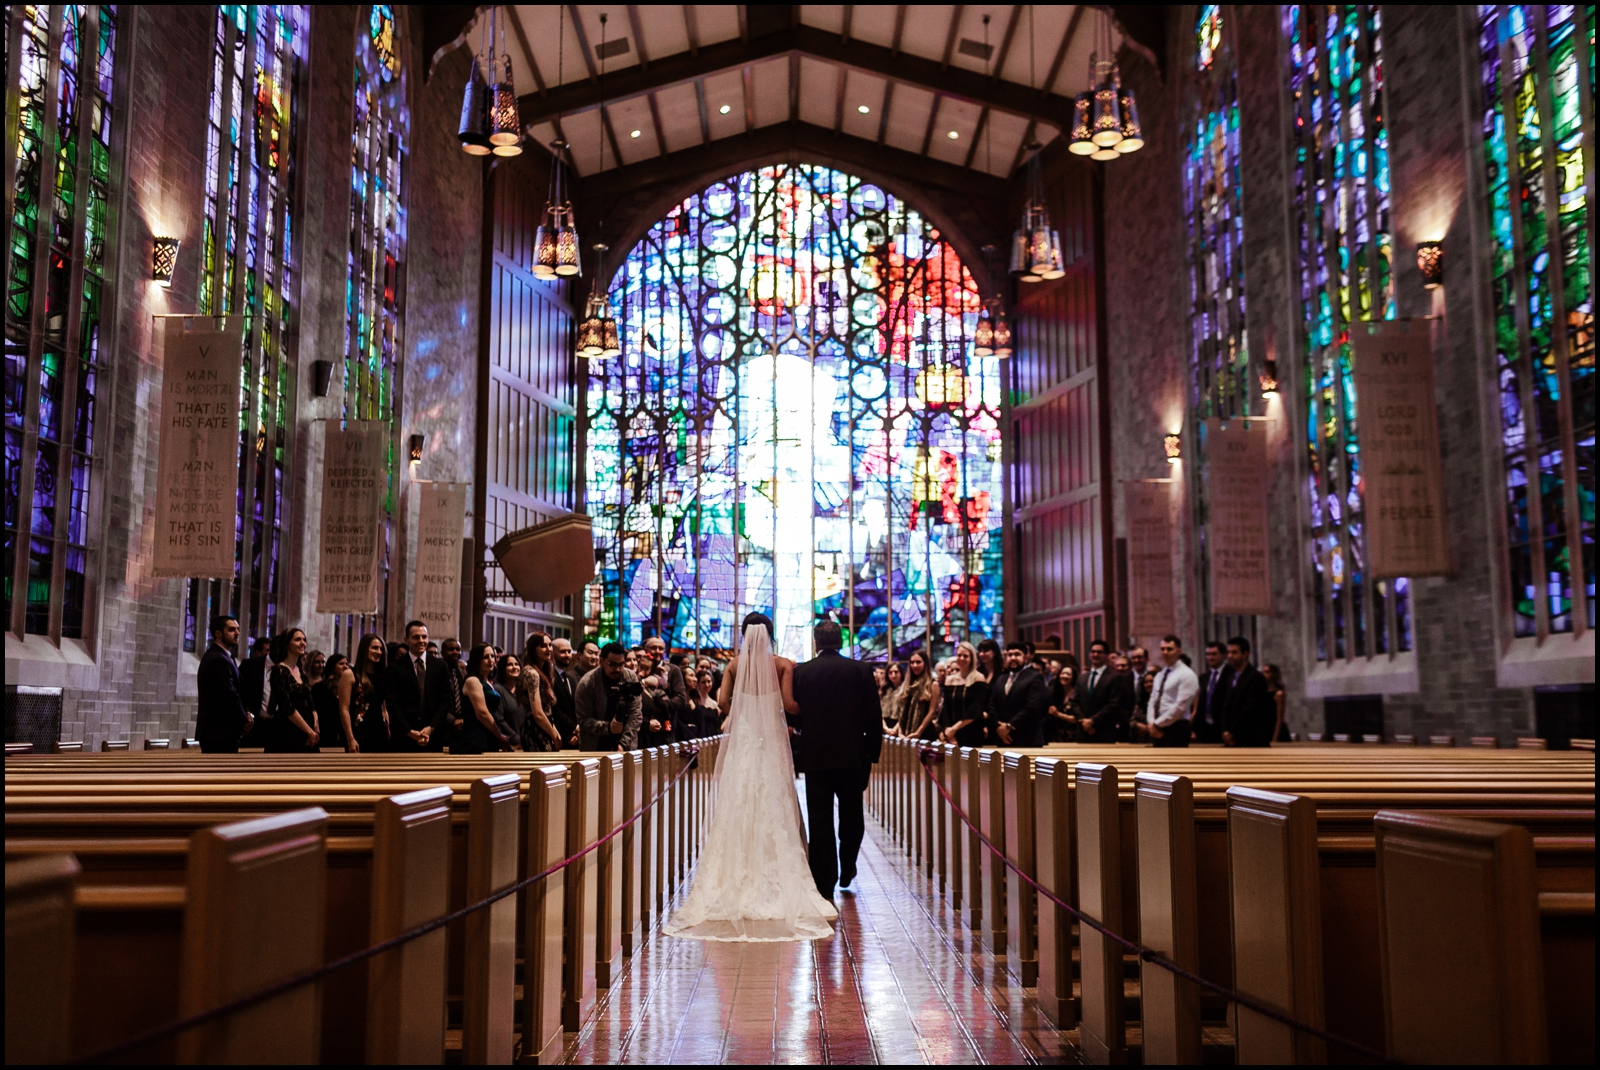 Chicago Wedding- Alice Millar Chapel Ceremony, London House Reception_0075.jpg